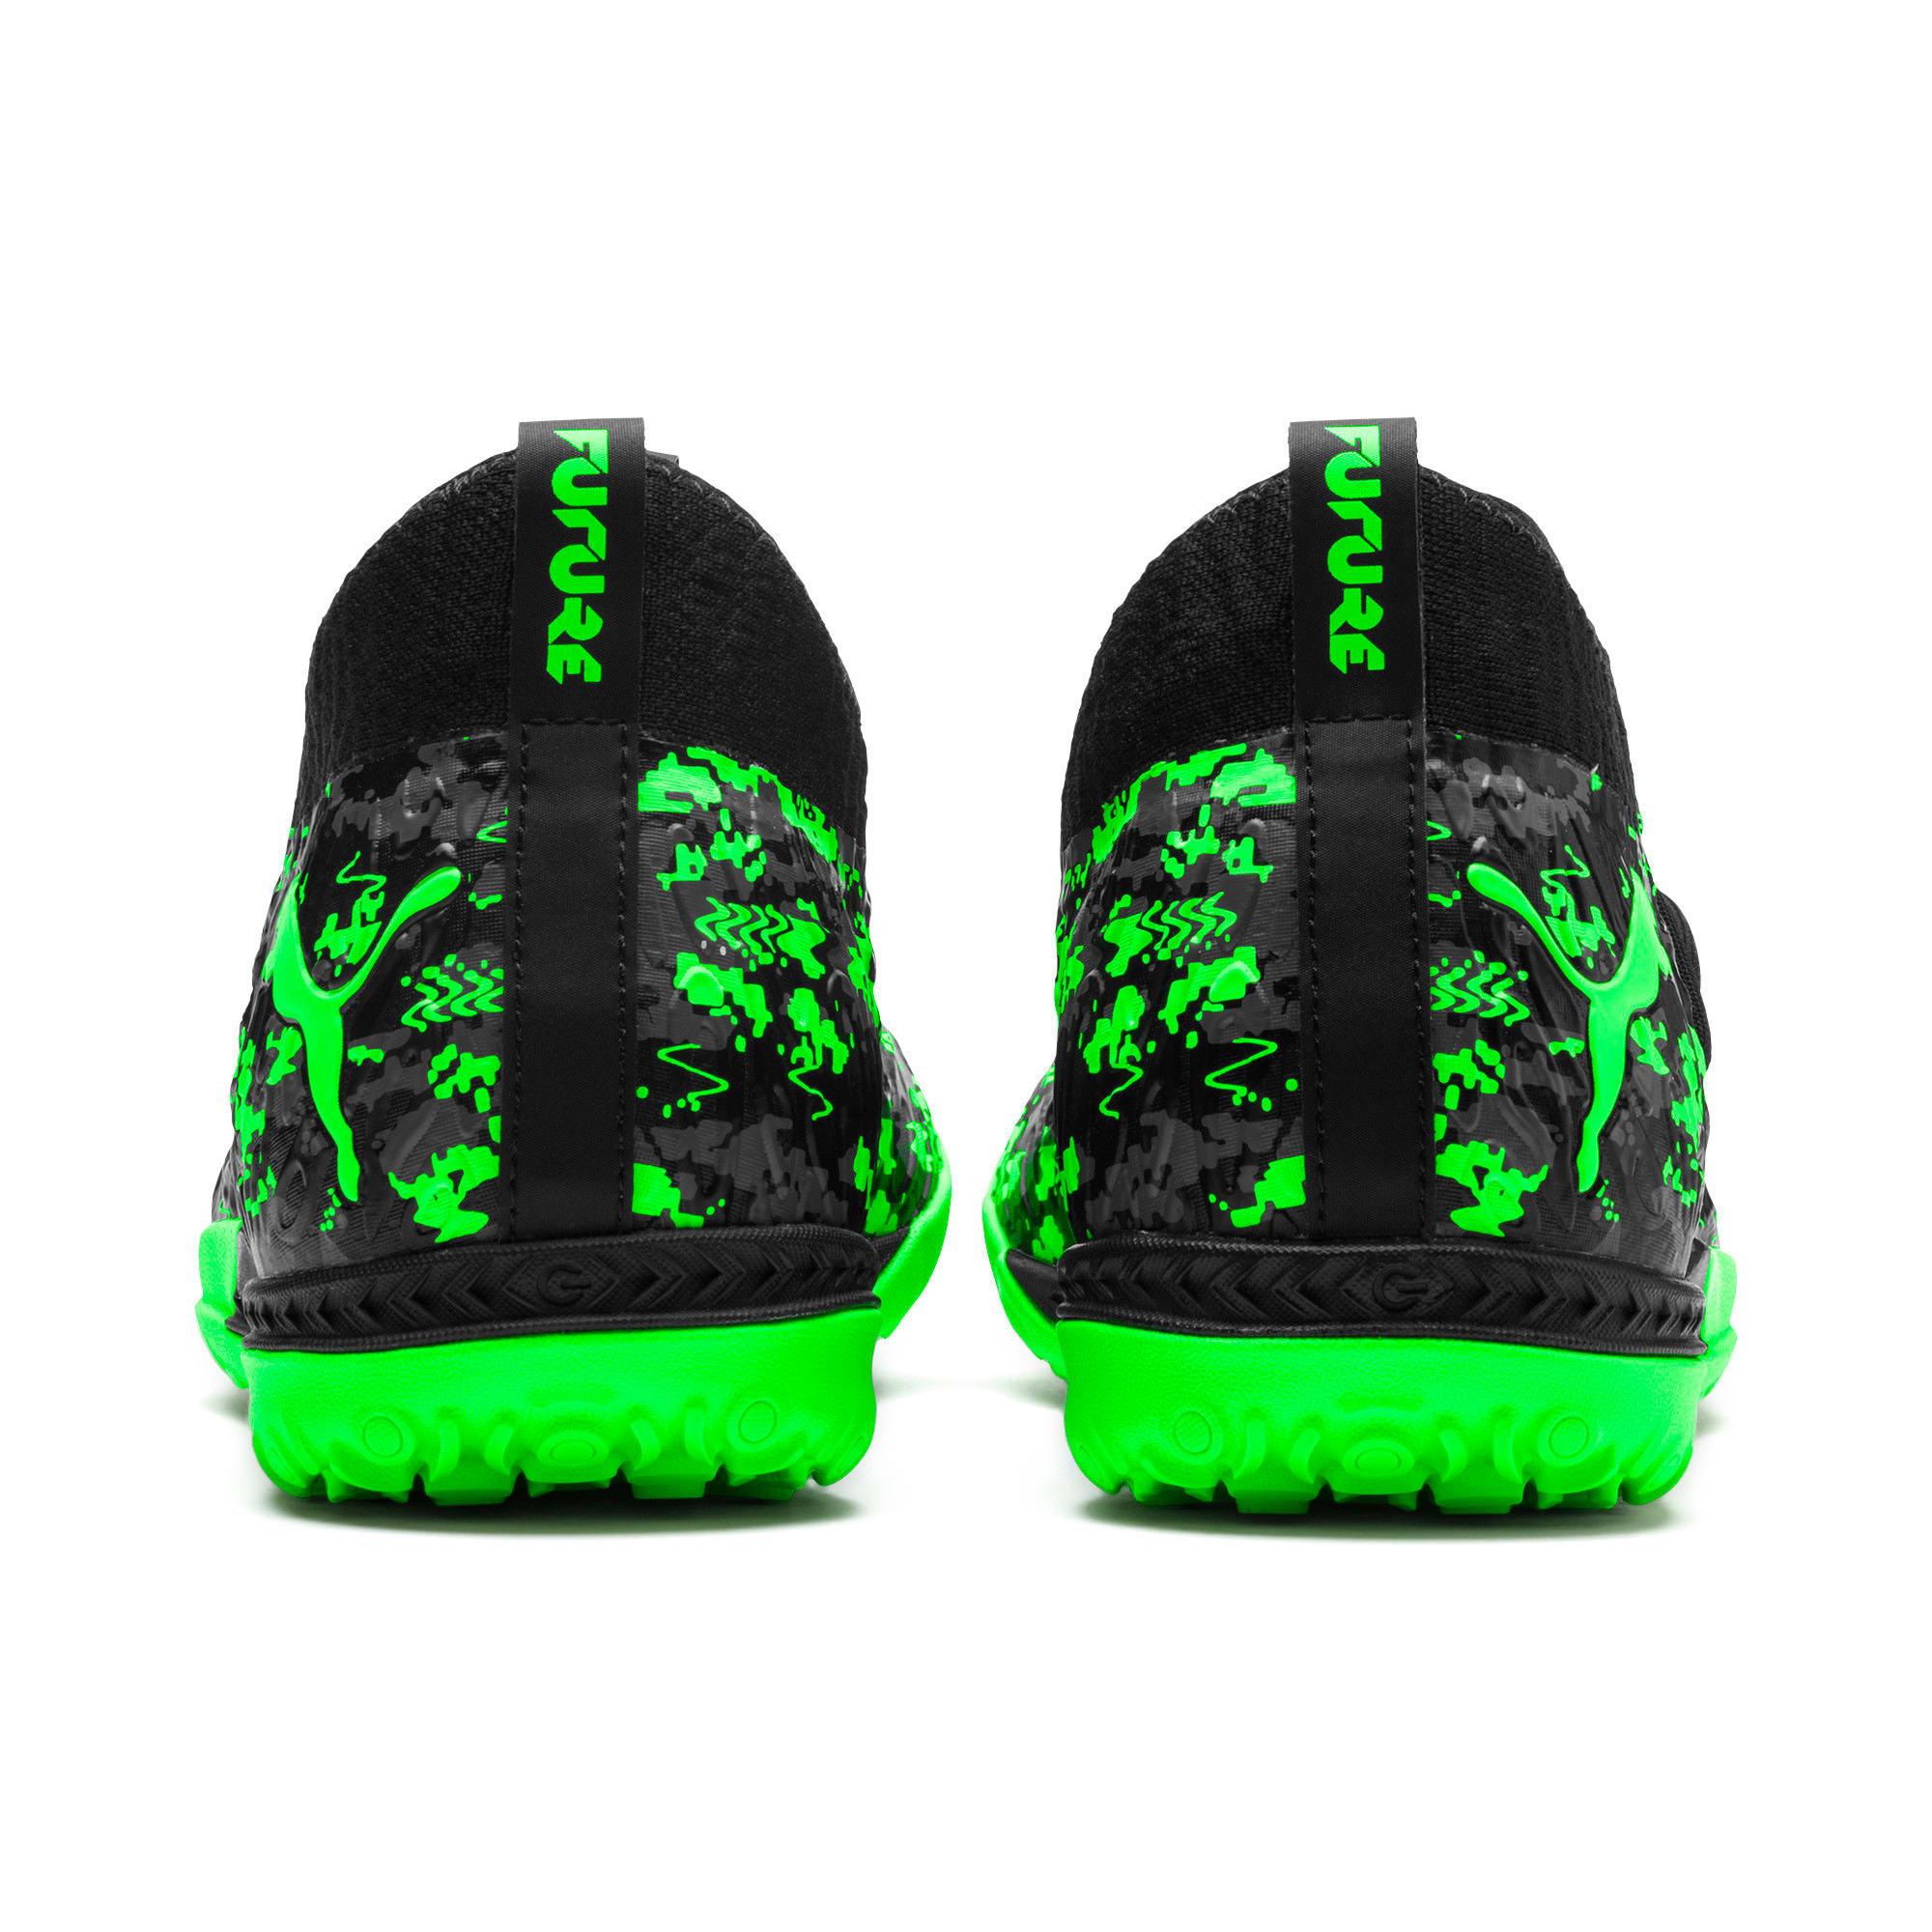 Thumbnail 3 of FUTURE 19.3 NETFIT TT Men's Soccer Shoes, Black-Gray-Green Gecko, medium